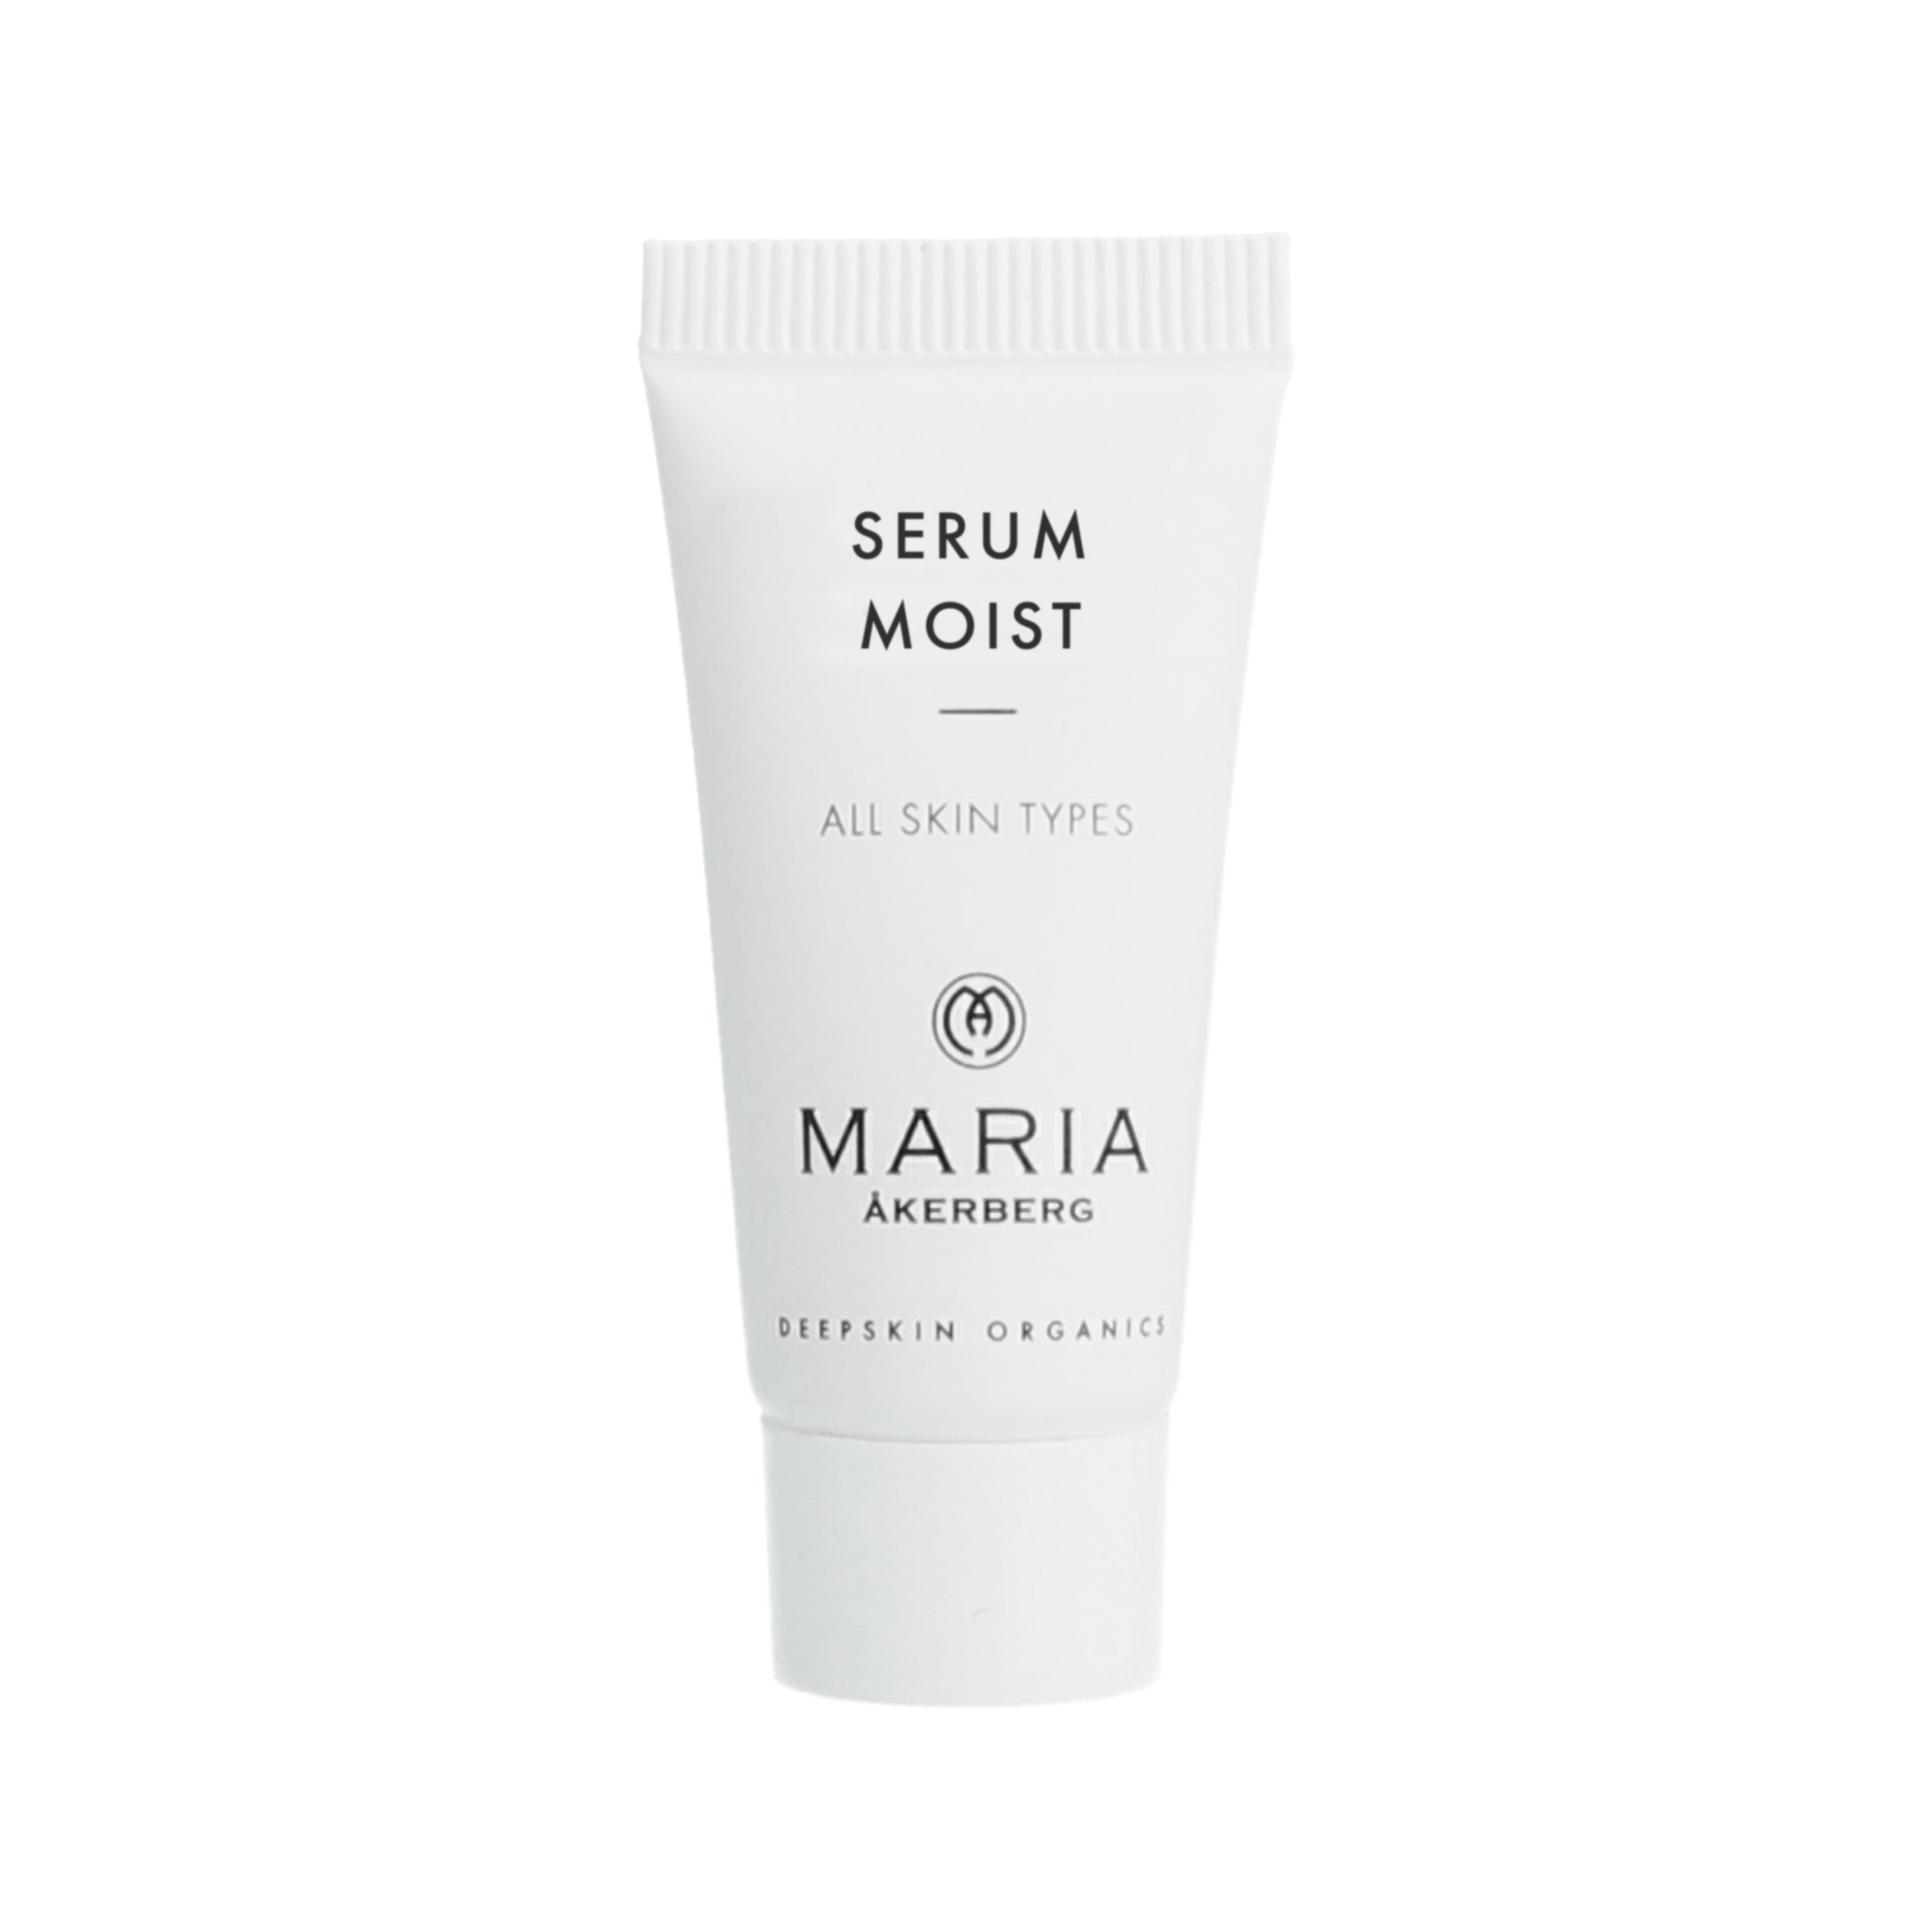 Serum Moist 5 ml